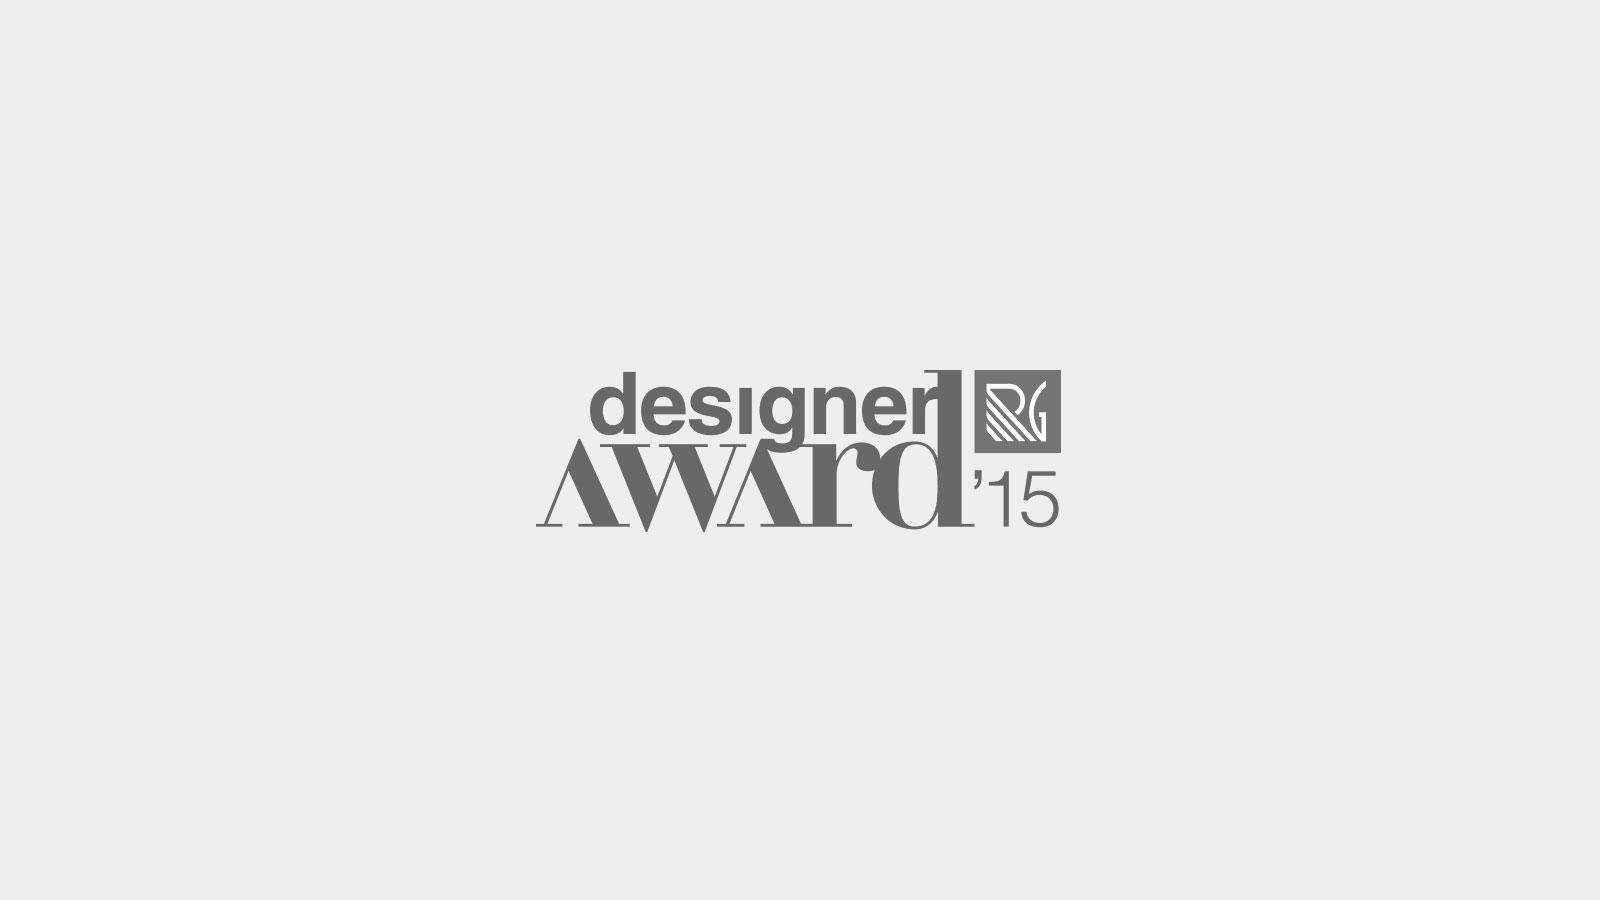 rg-designer-award-logo-1600x900-3